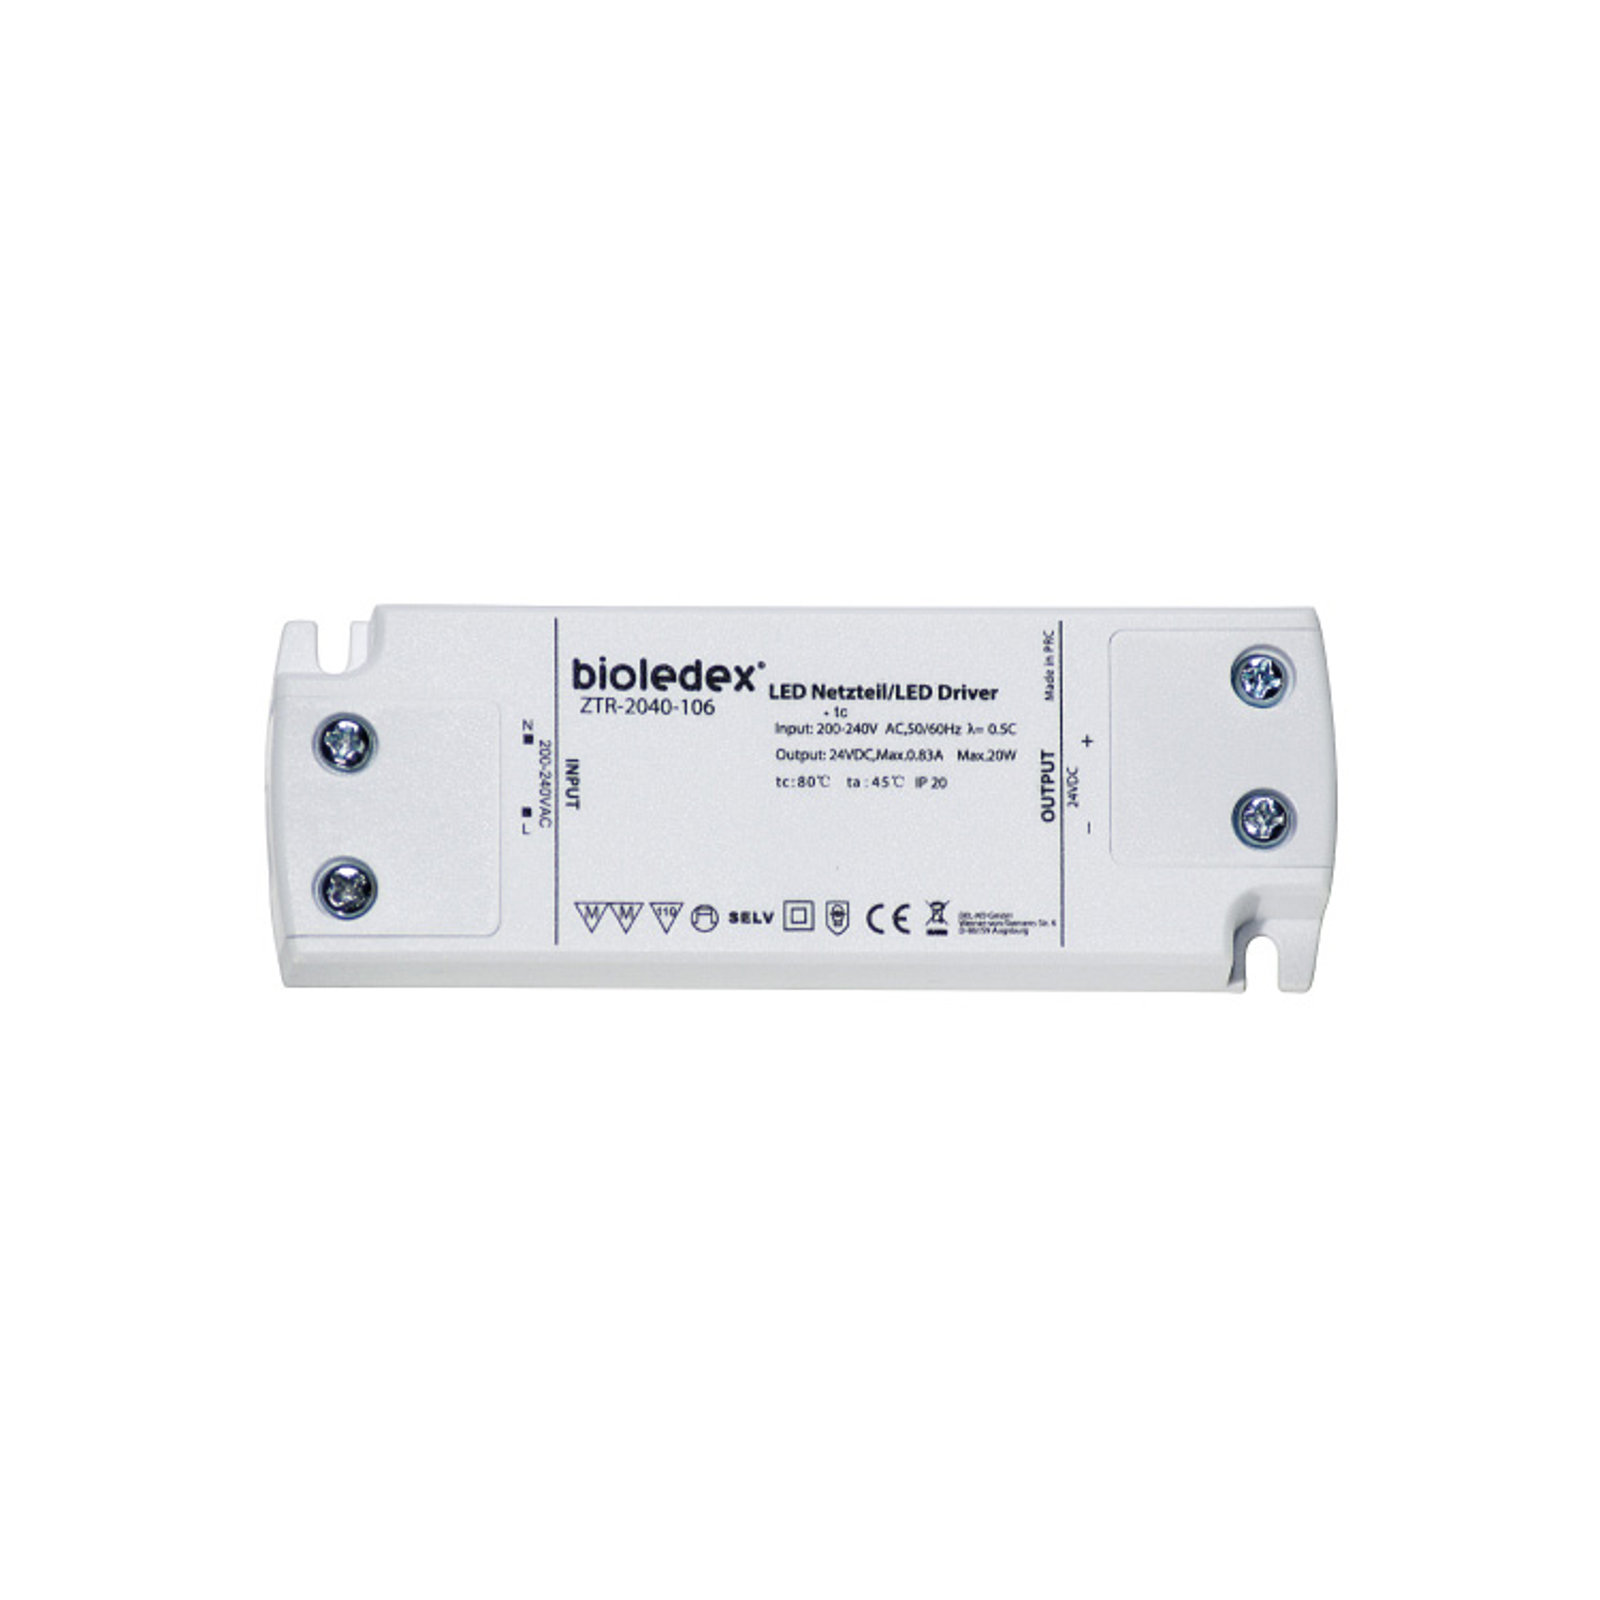 Bloc d'alimentation LED ZTR-2040-106 24V DC 20W